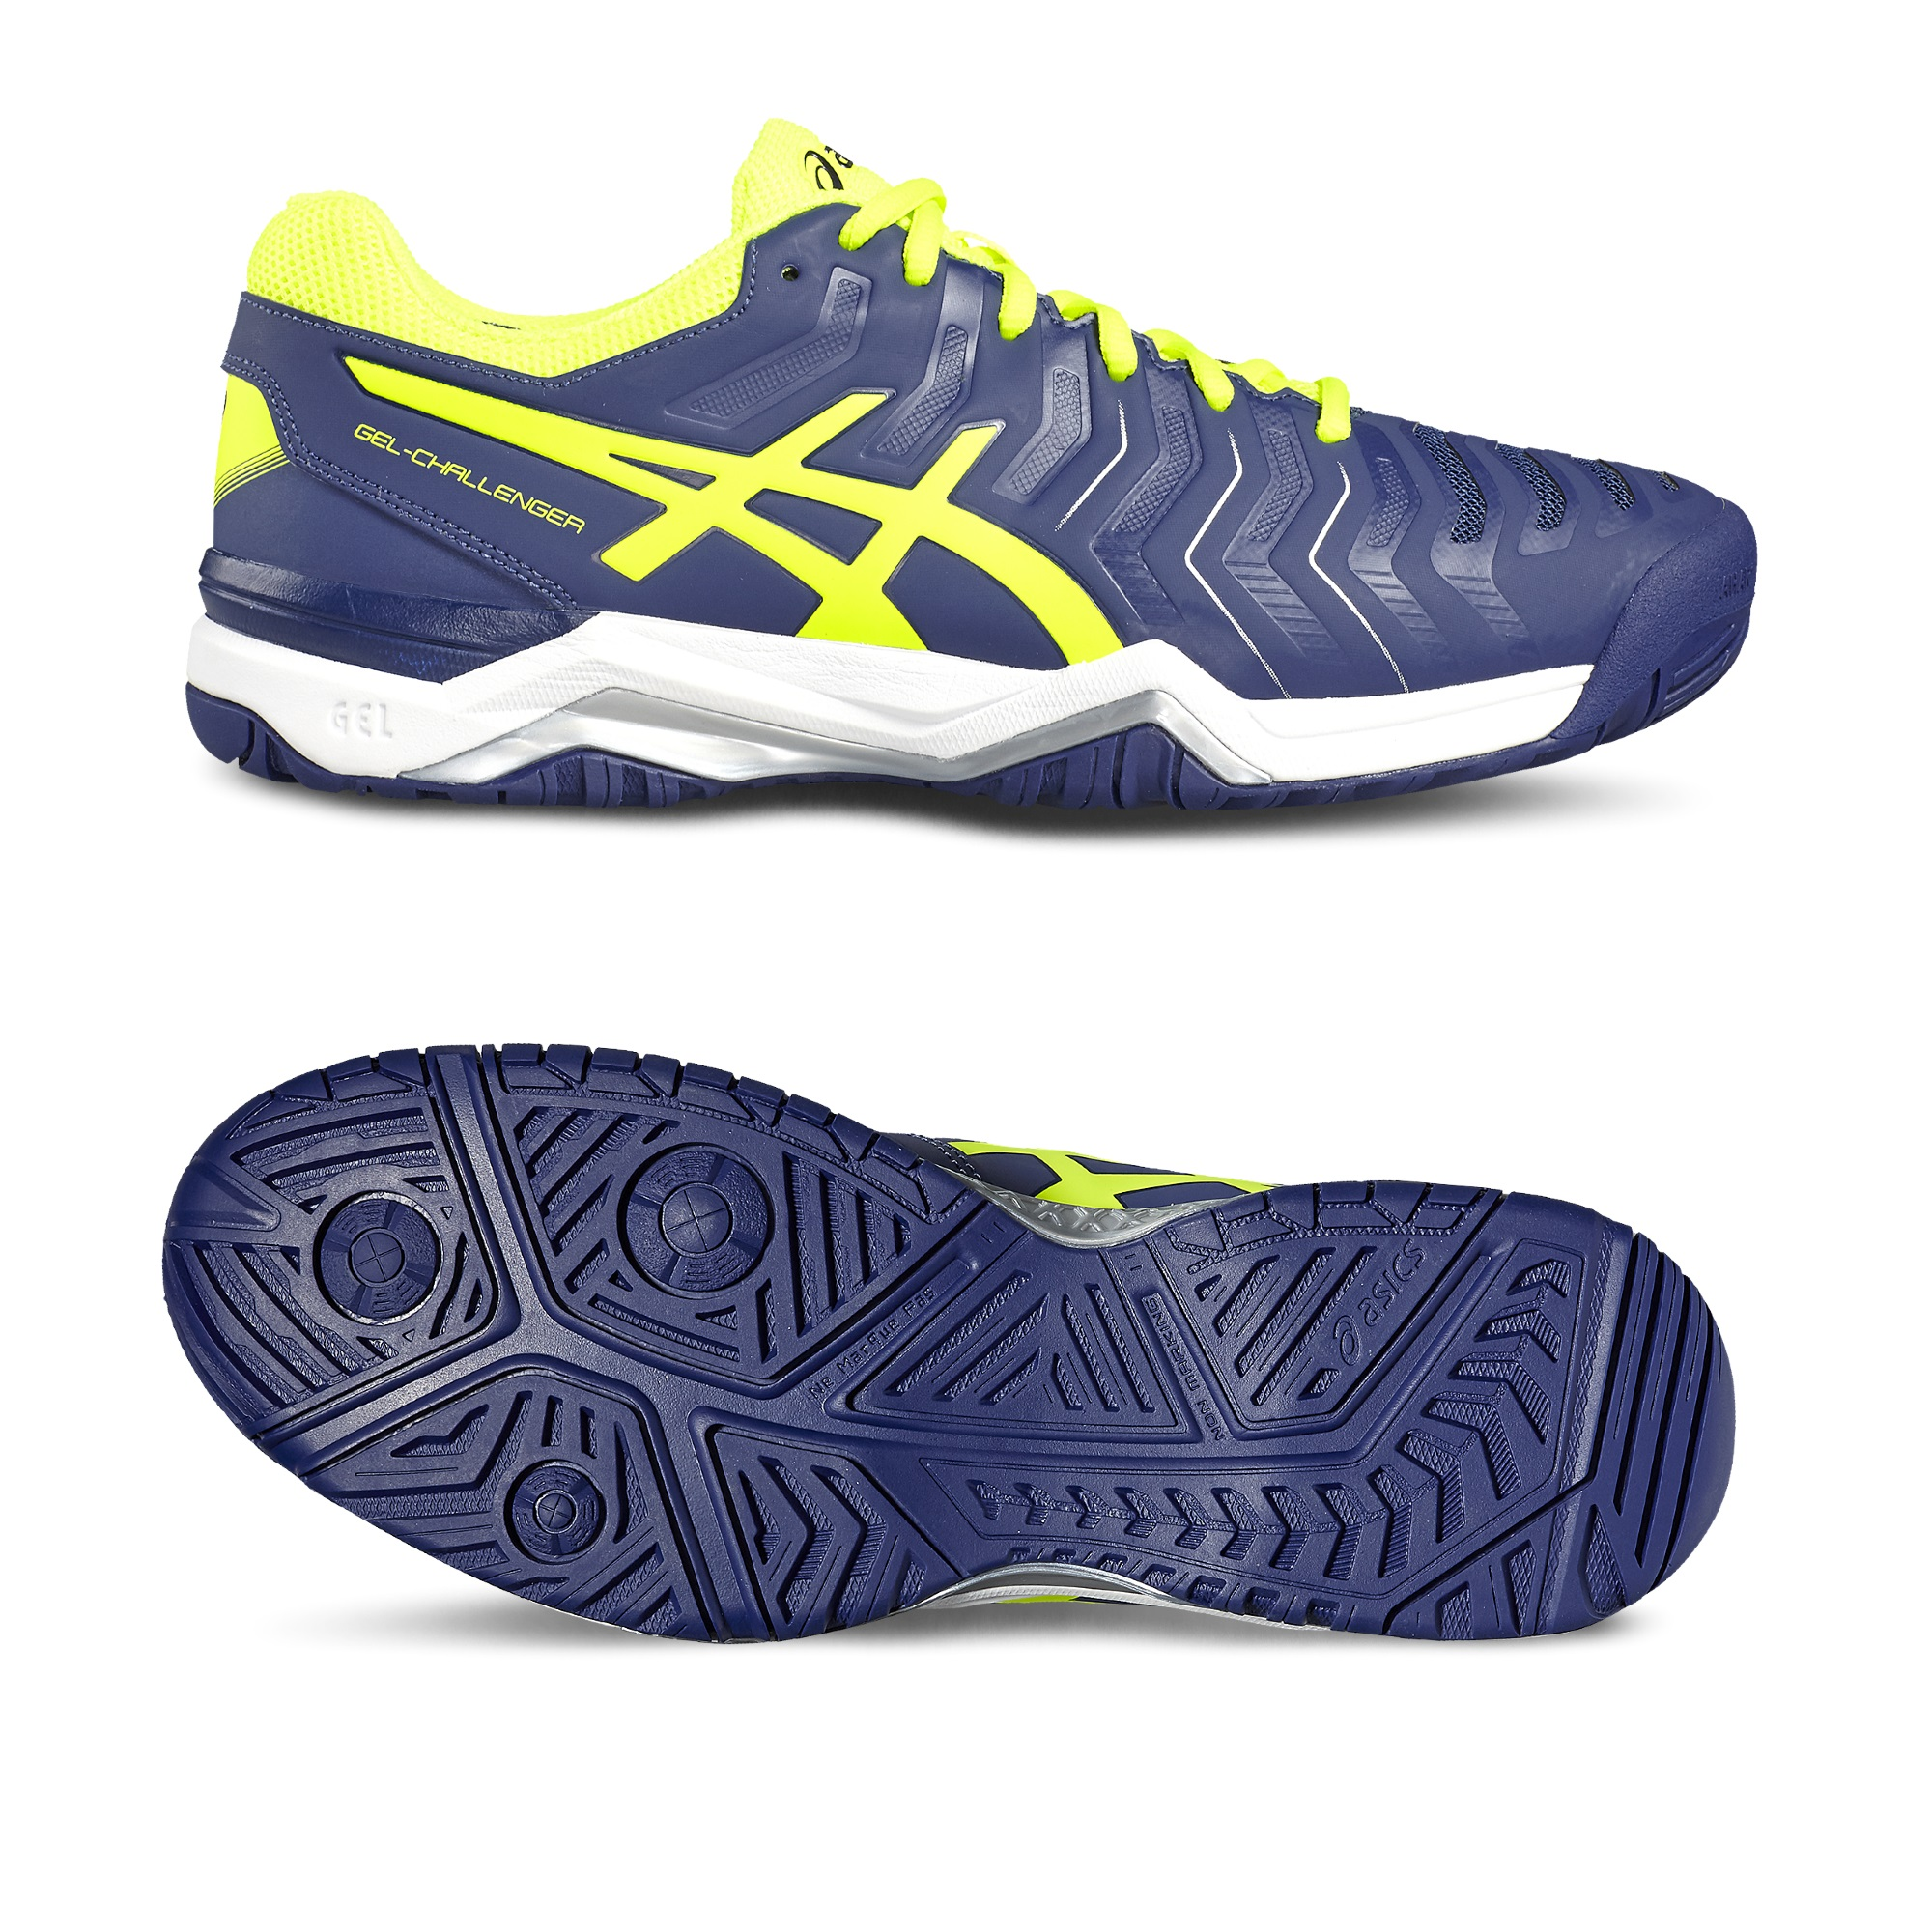 Asics GelChallenger 11 Mens Tennis Shoes  BlueYellow 8.5 UK